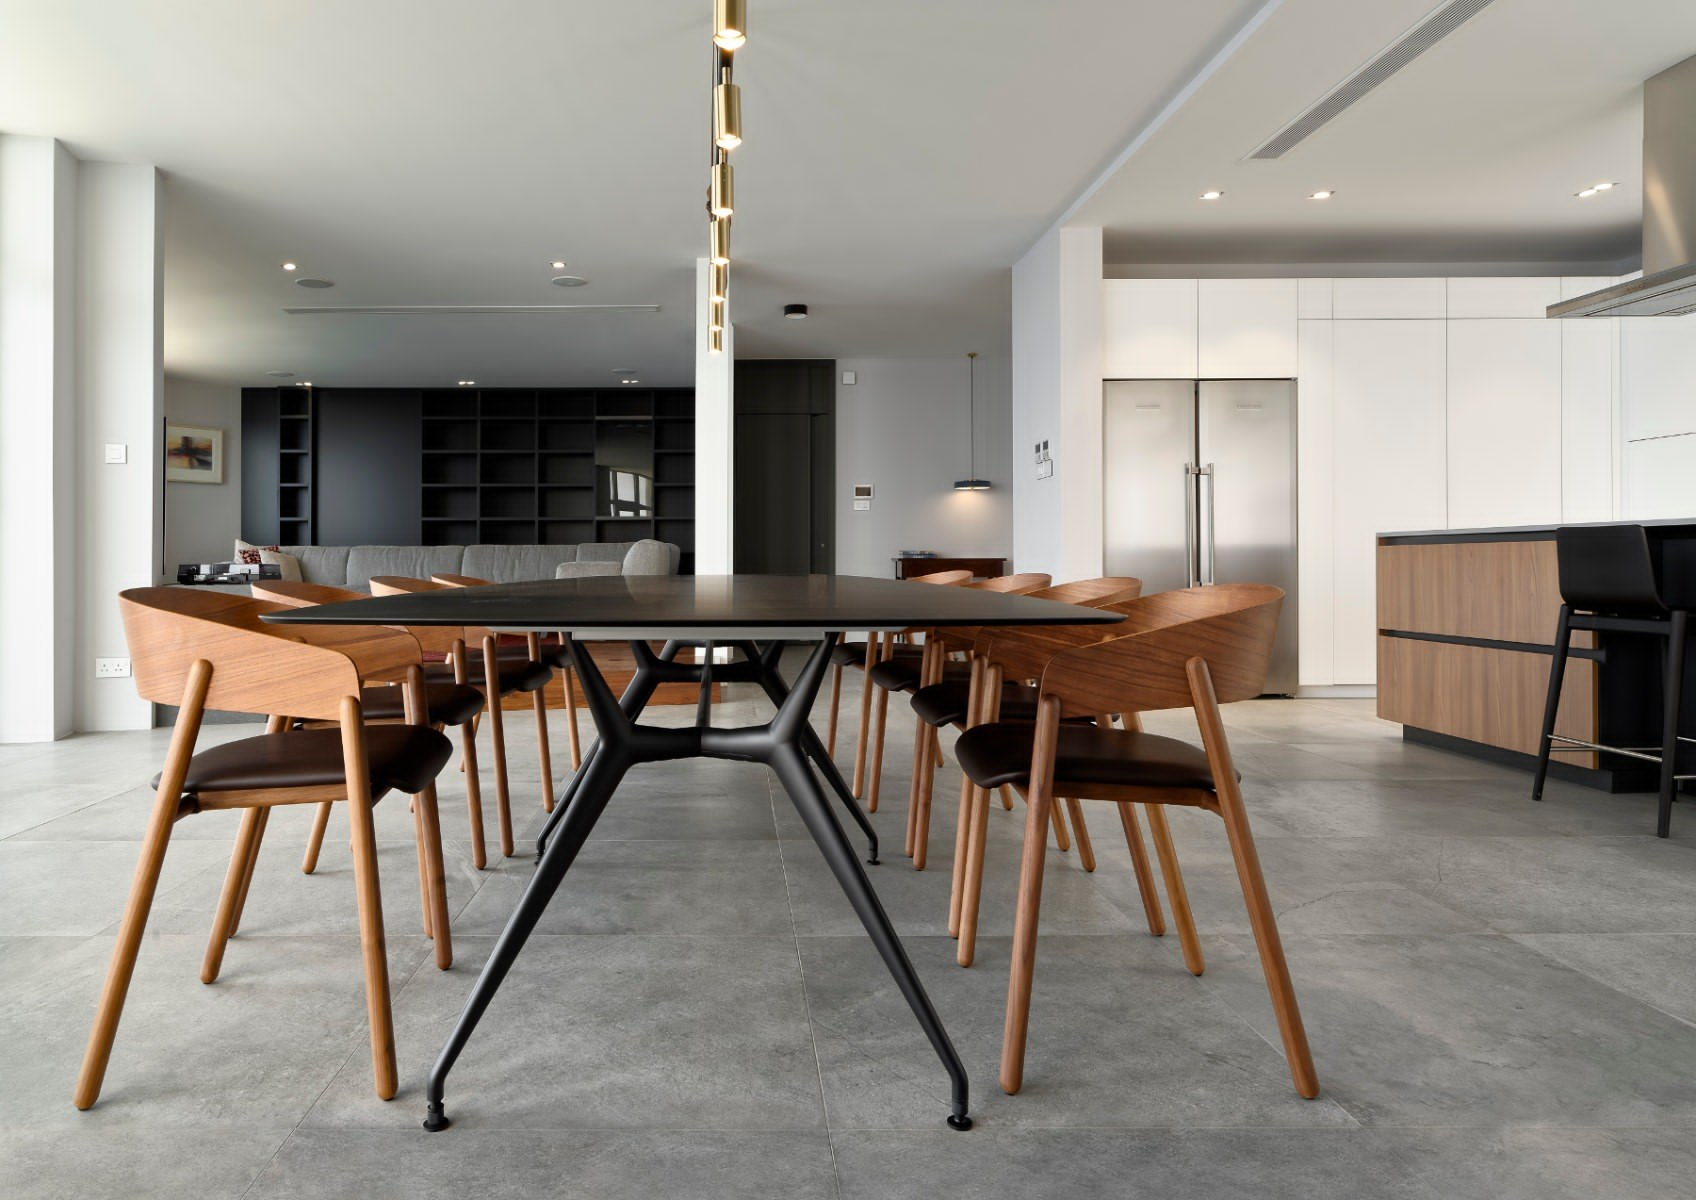 Furniture design Malta, CMC Arredi La Torre